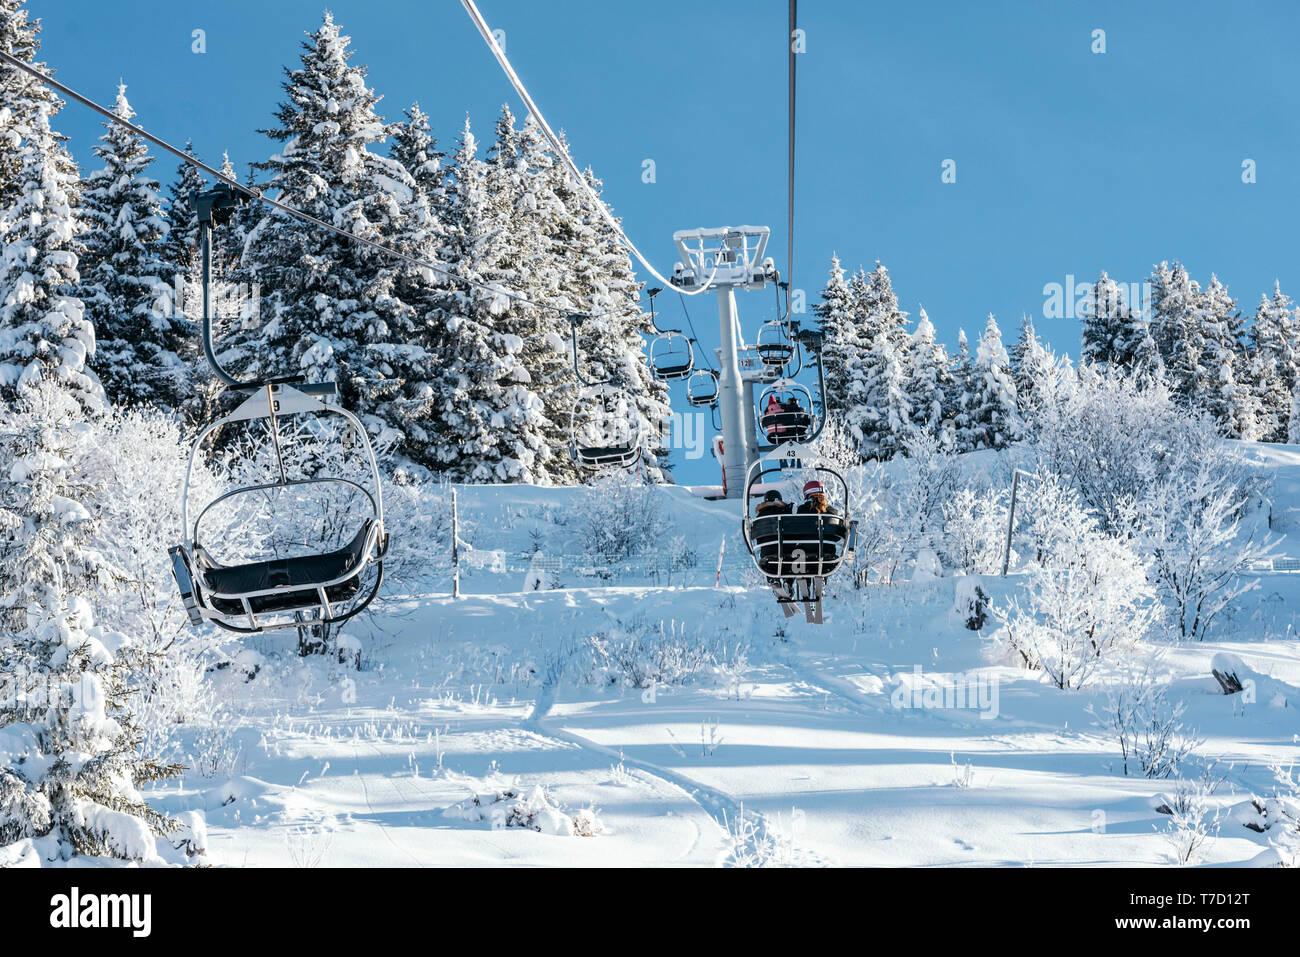 La Clusaz (eastern France): chairlifts above the ski slopes of the ski resort Stock Photo